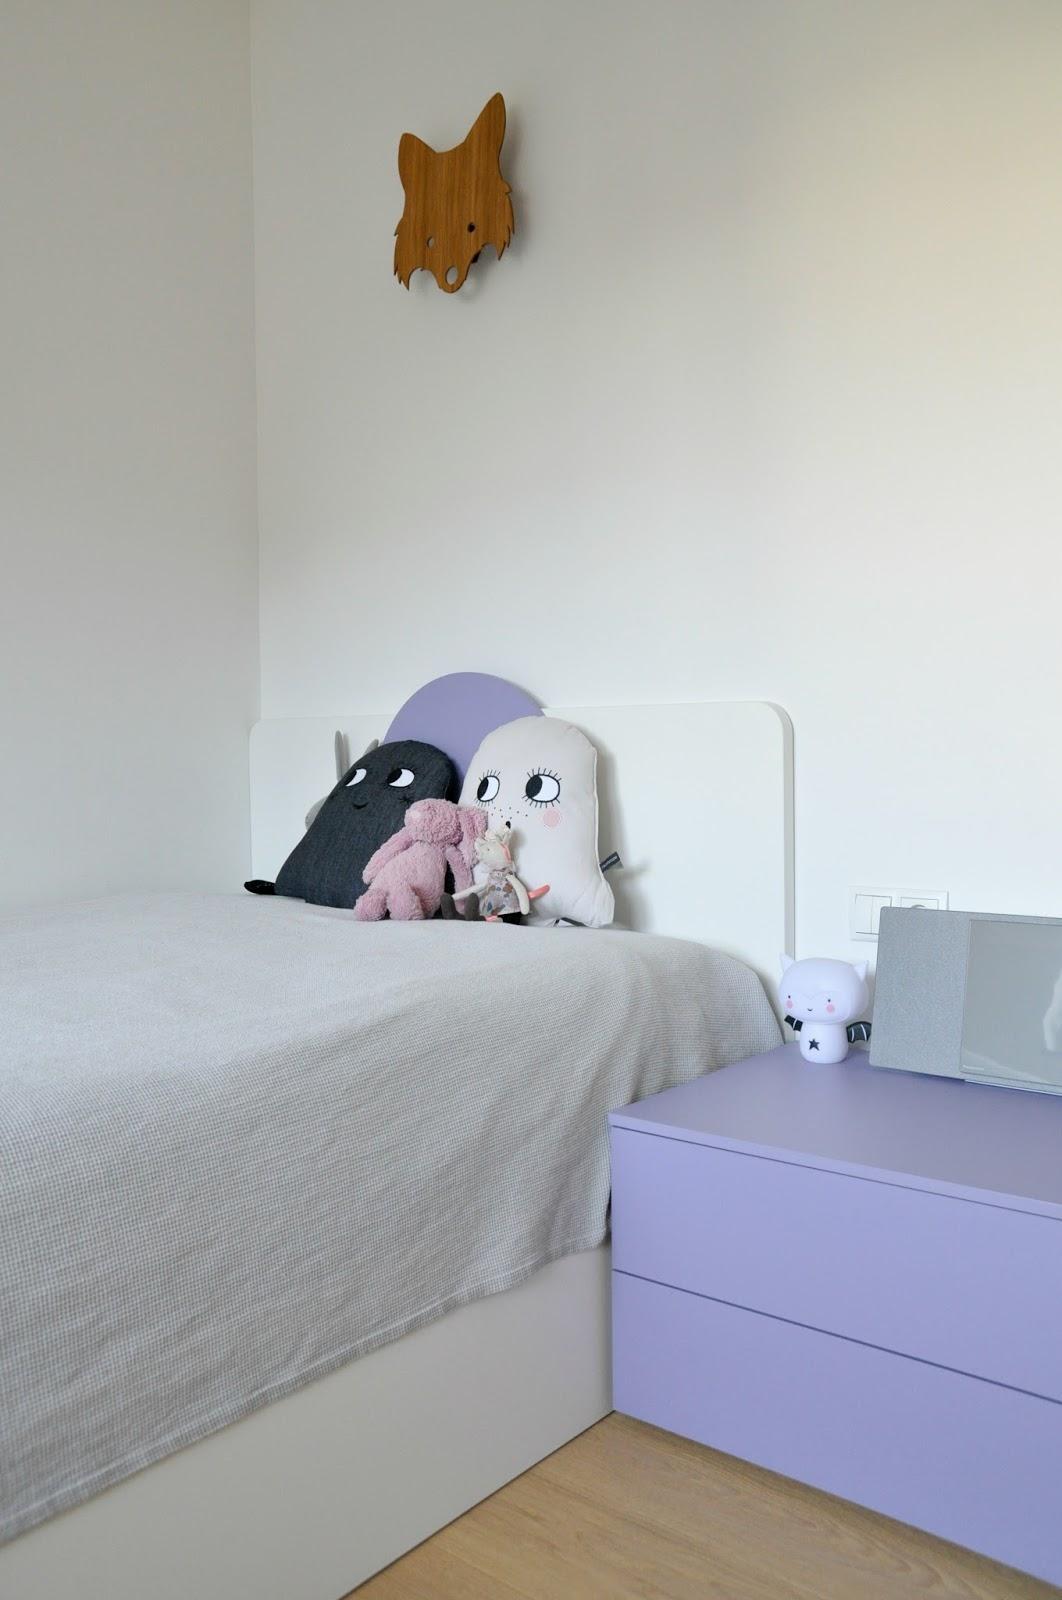 Lemapi s dtiroler lifestyleblog kinderzimmer update mit for Kinderzimmer 7 5 m2